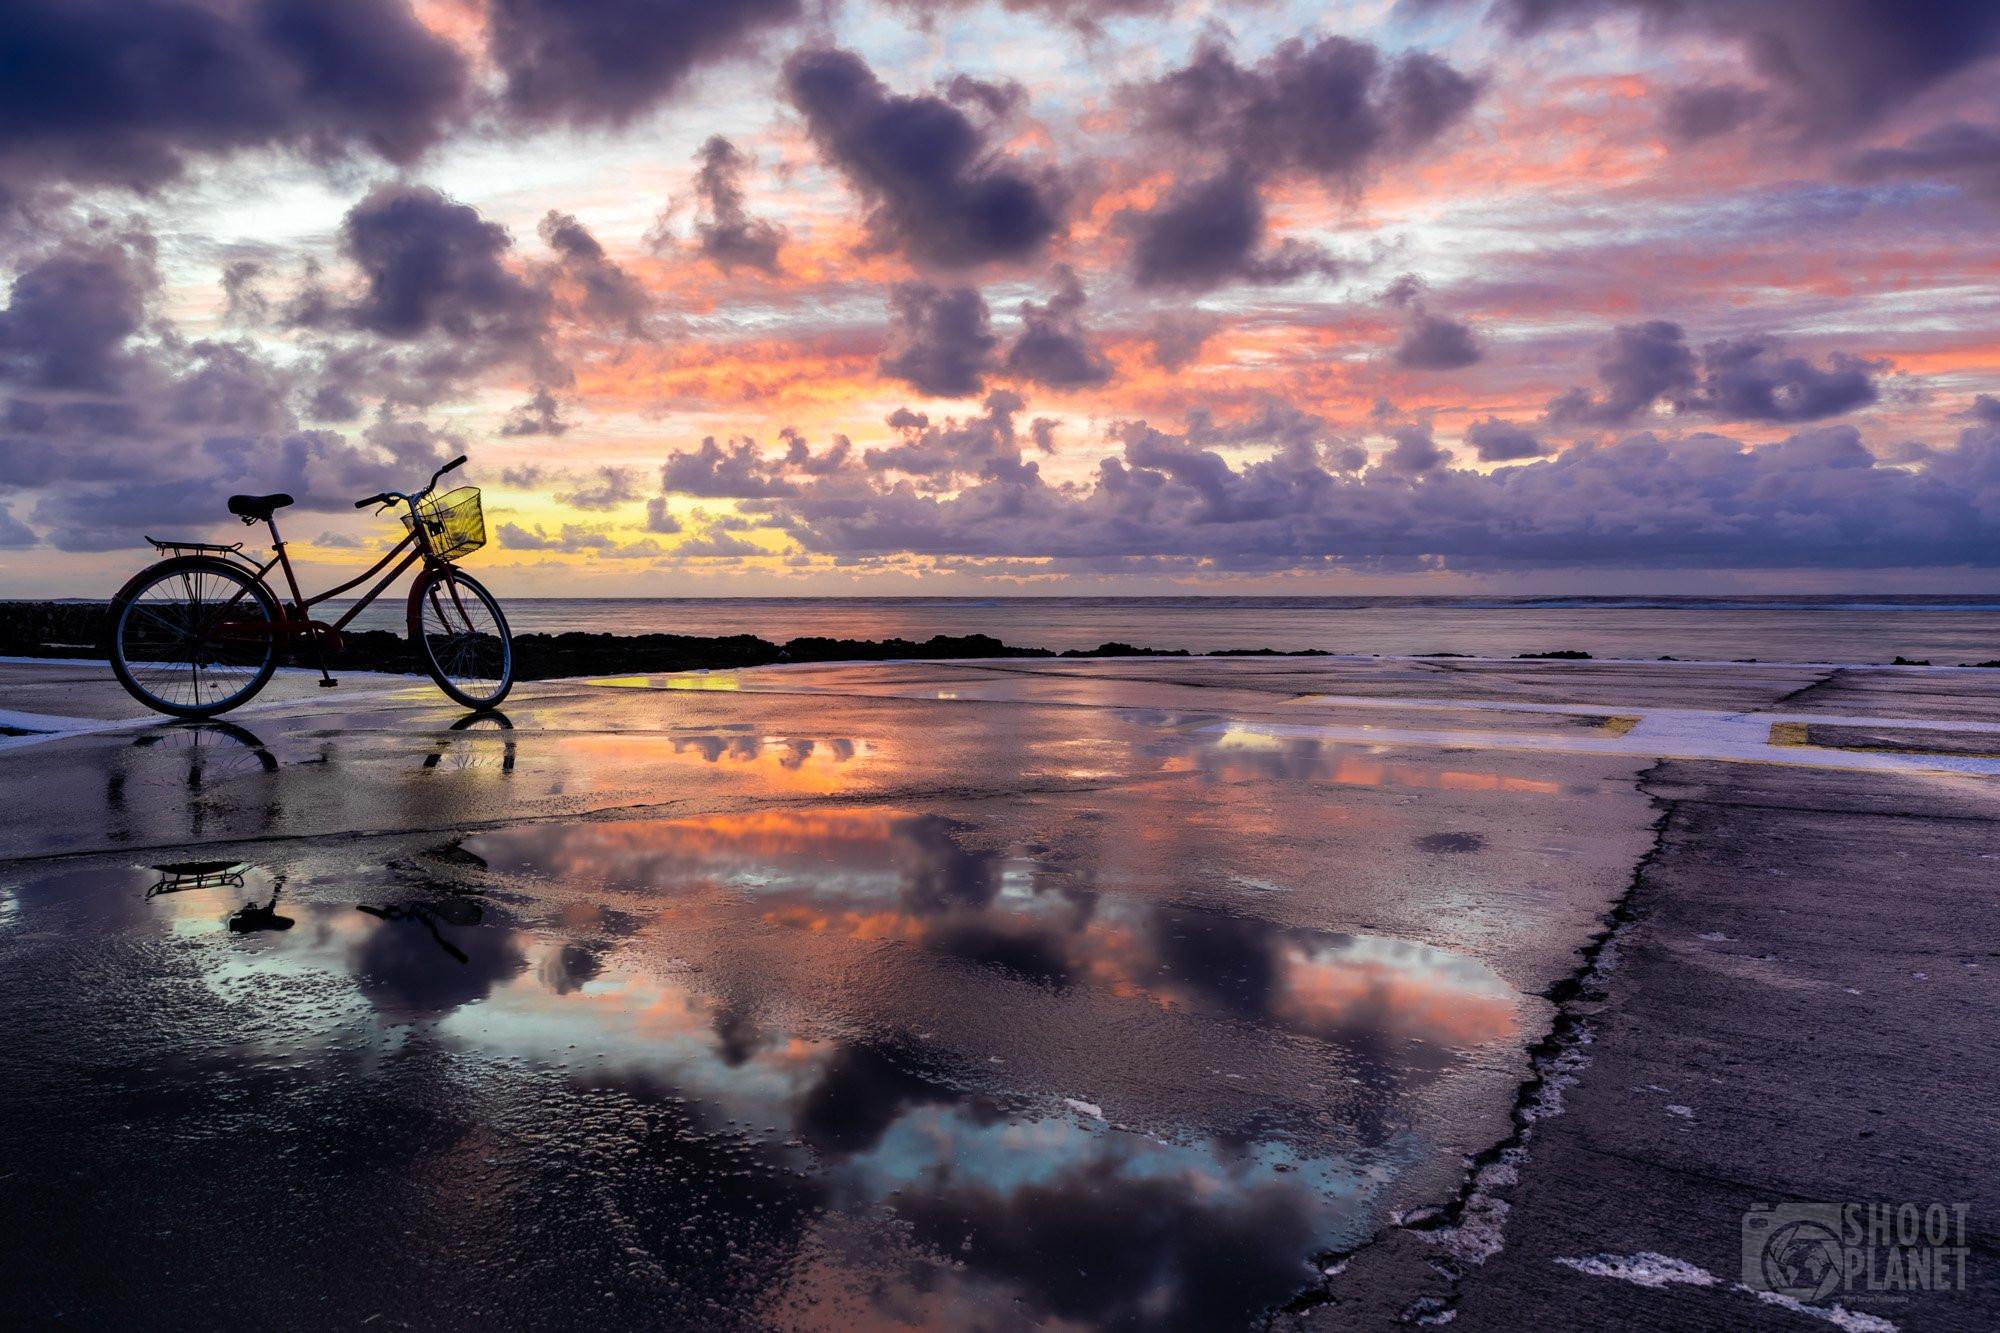 Bora Bora sunrise reflection at helicopter airstrip